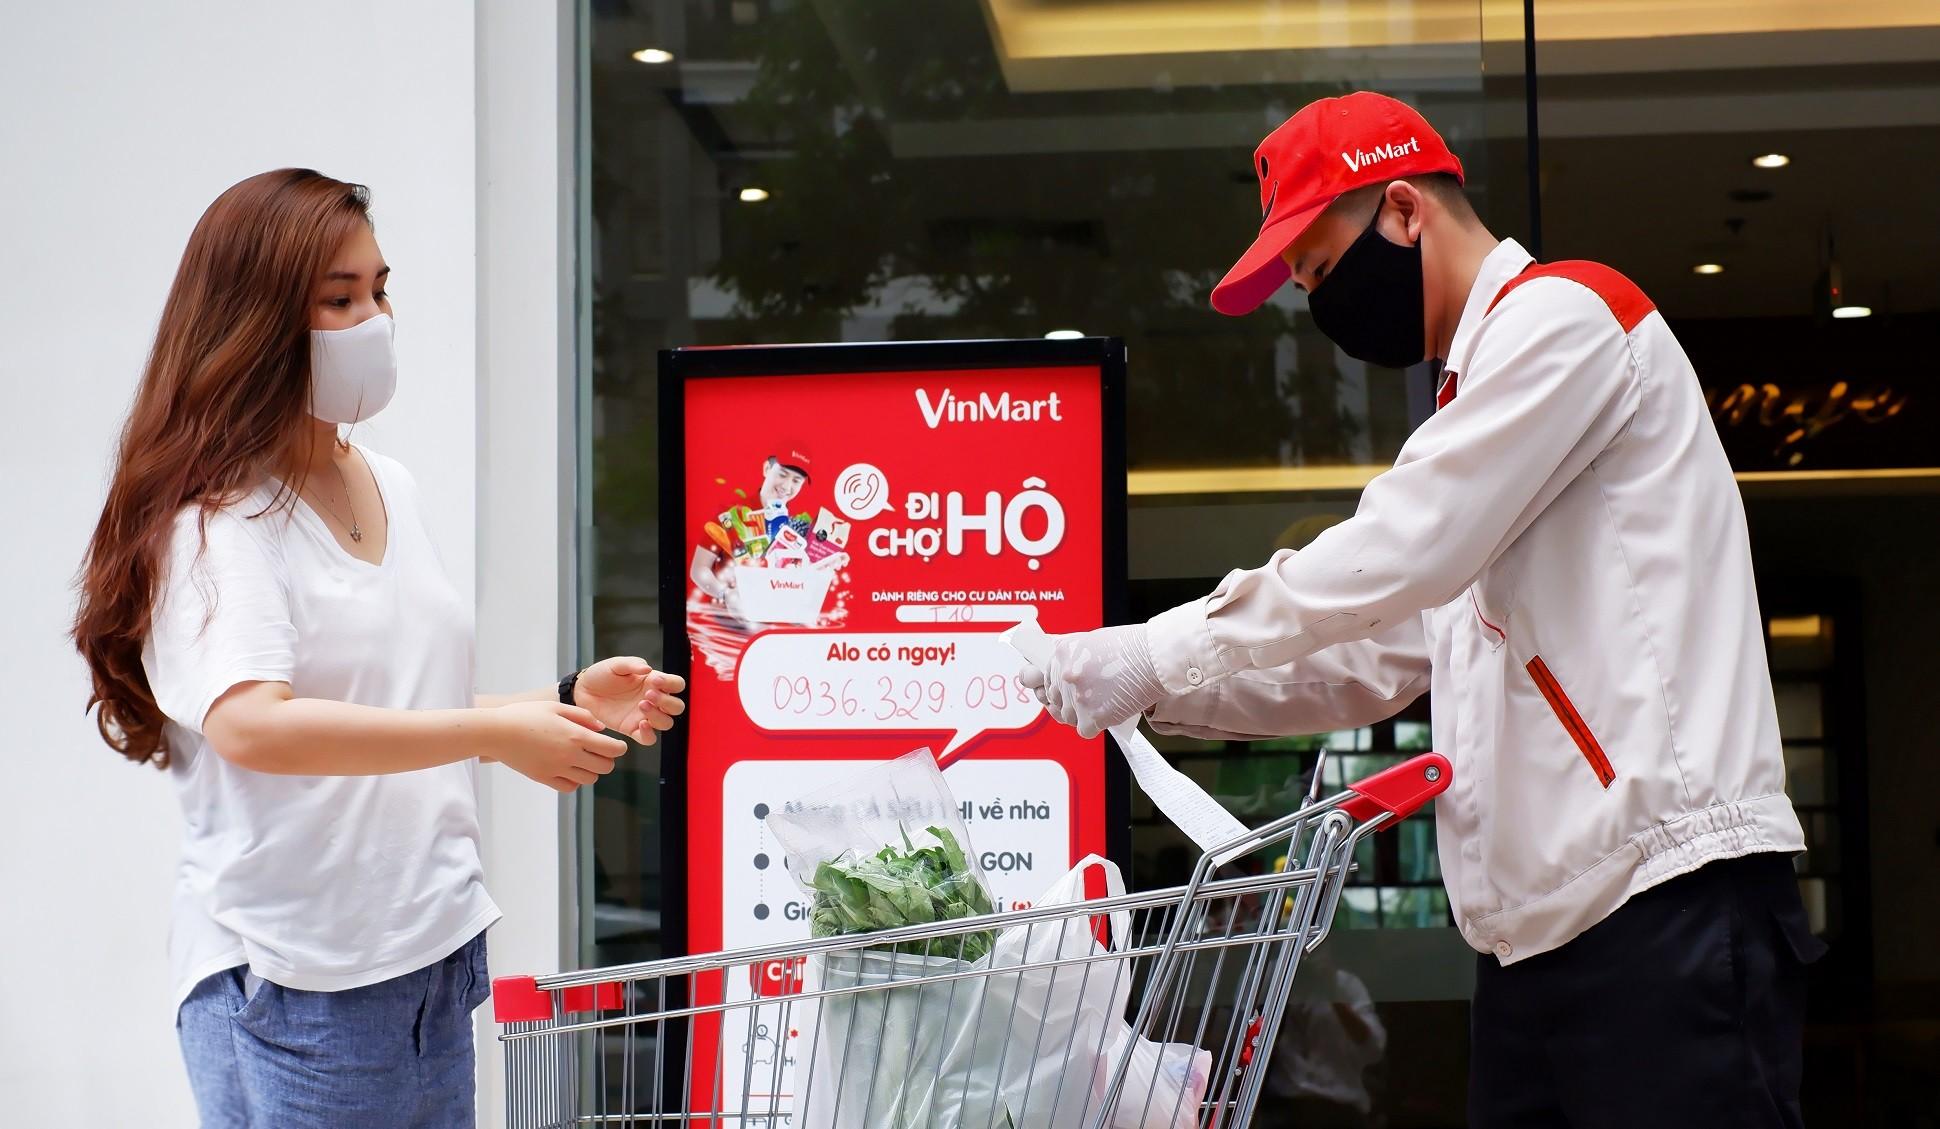 khach-hang-su-dung-dich-vu-di-cho-ho-tai-vinmart-1625114539.JPG